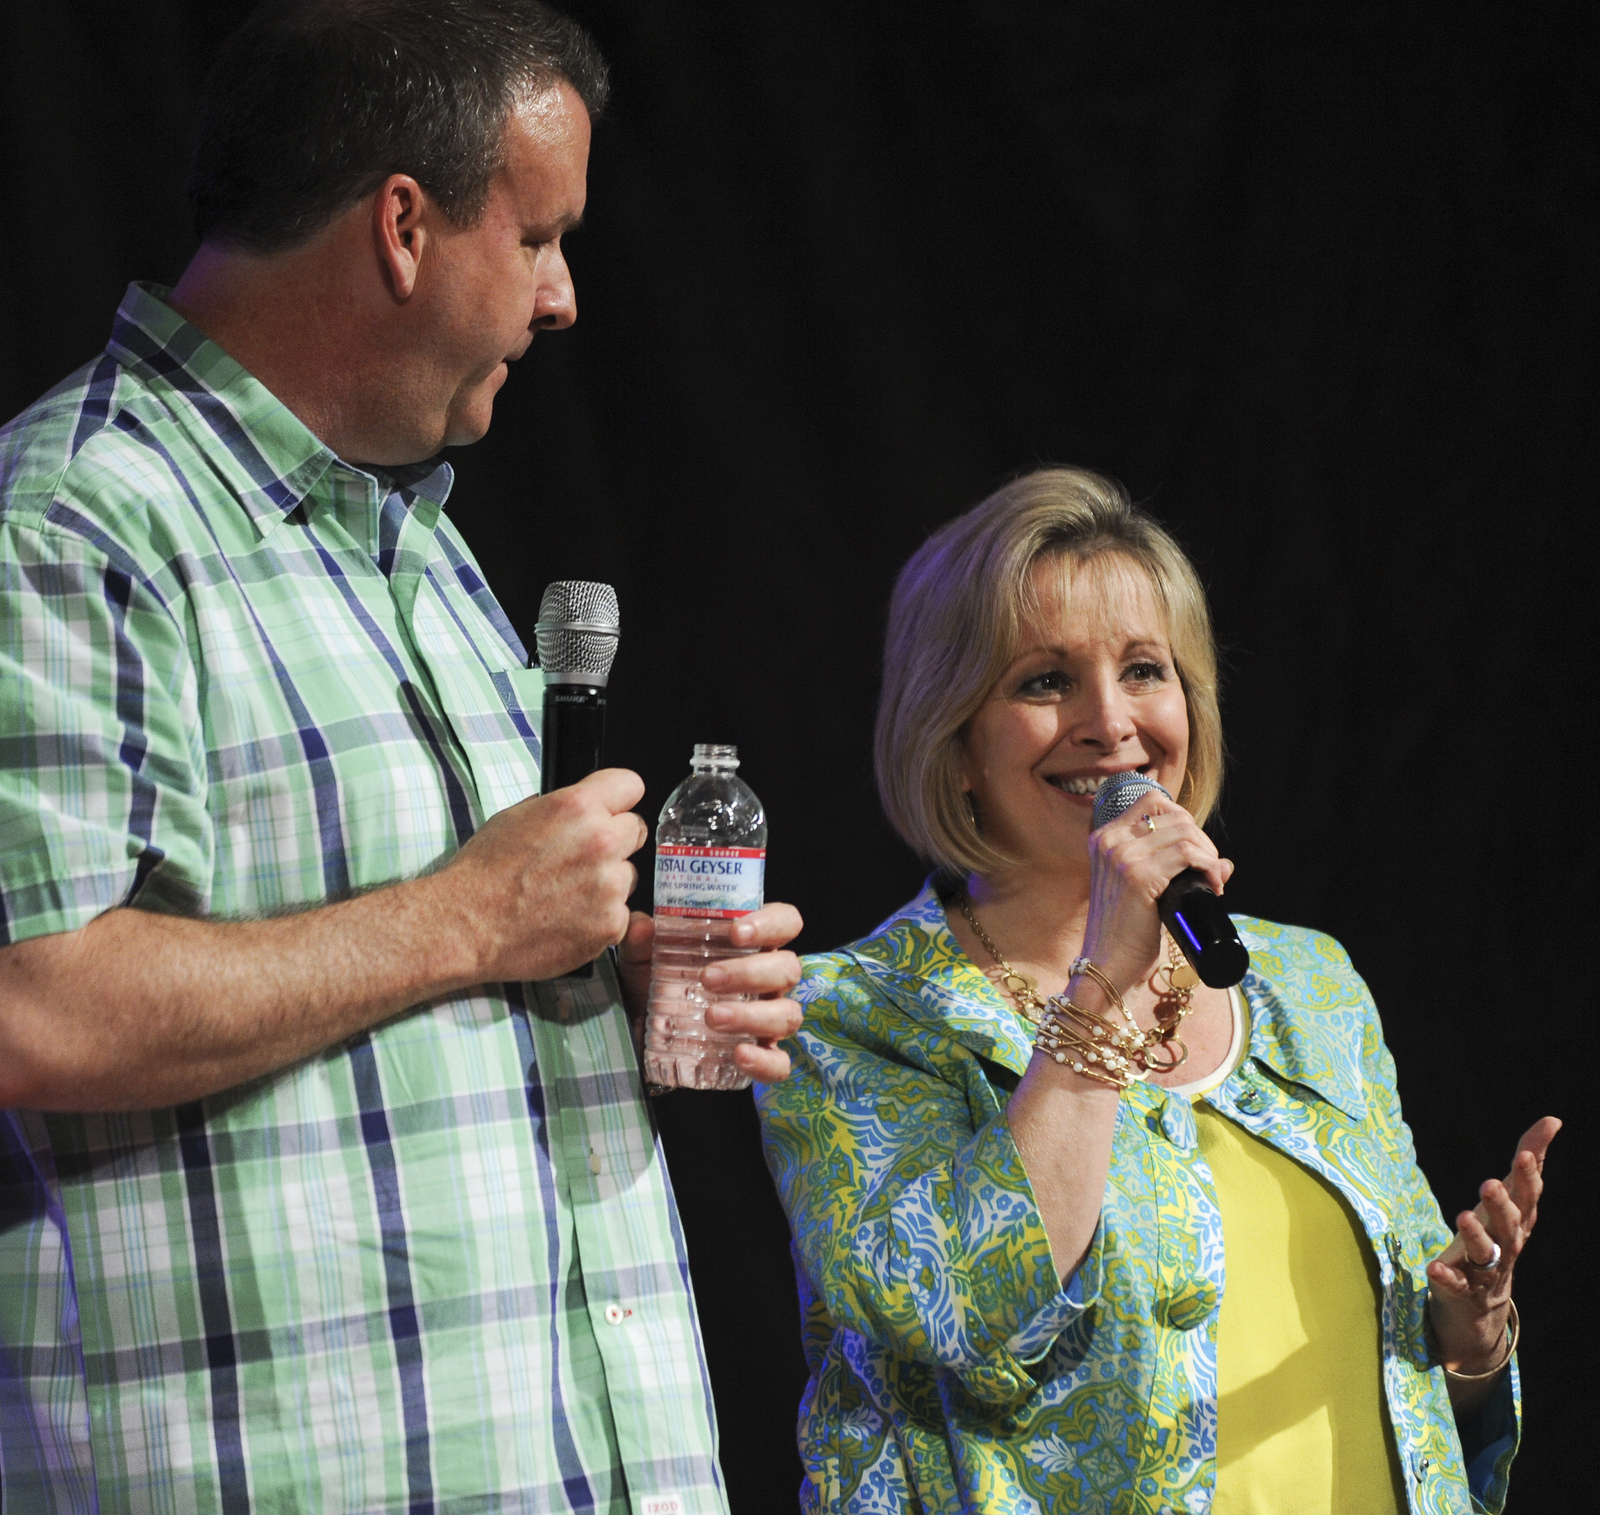 Jeff & Becky Dollar